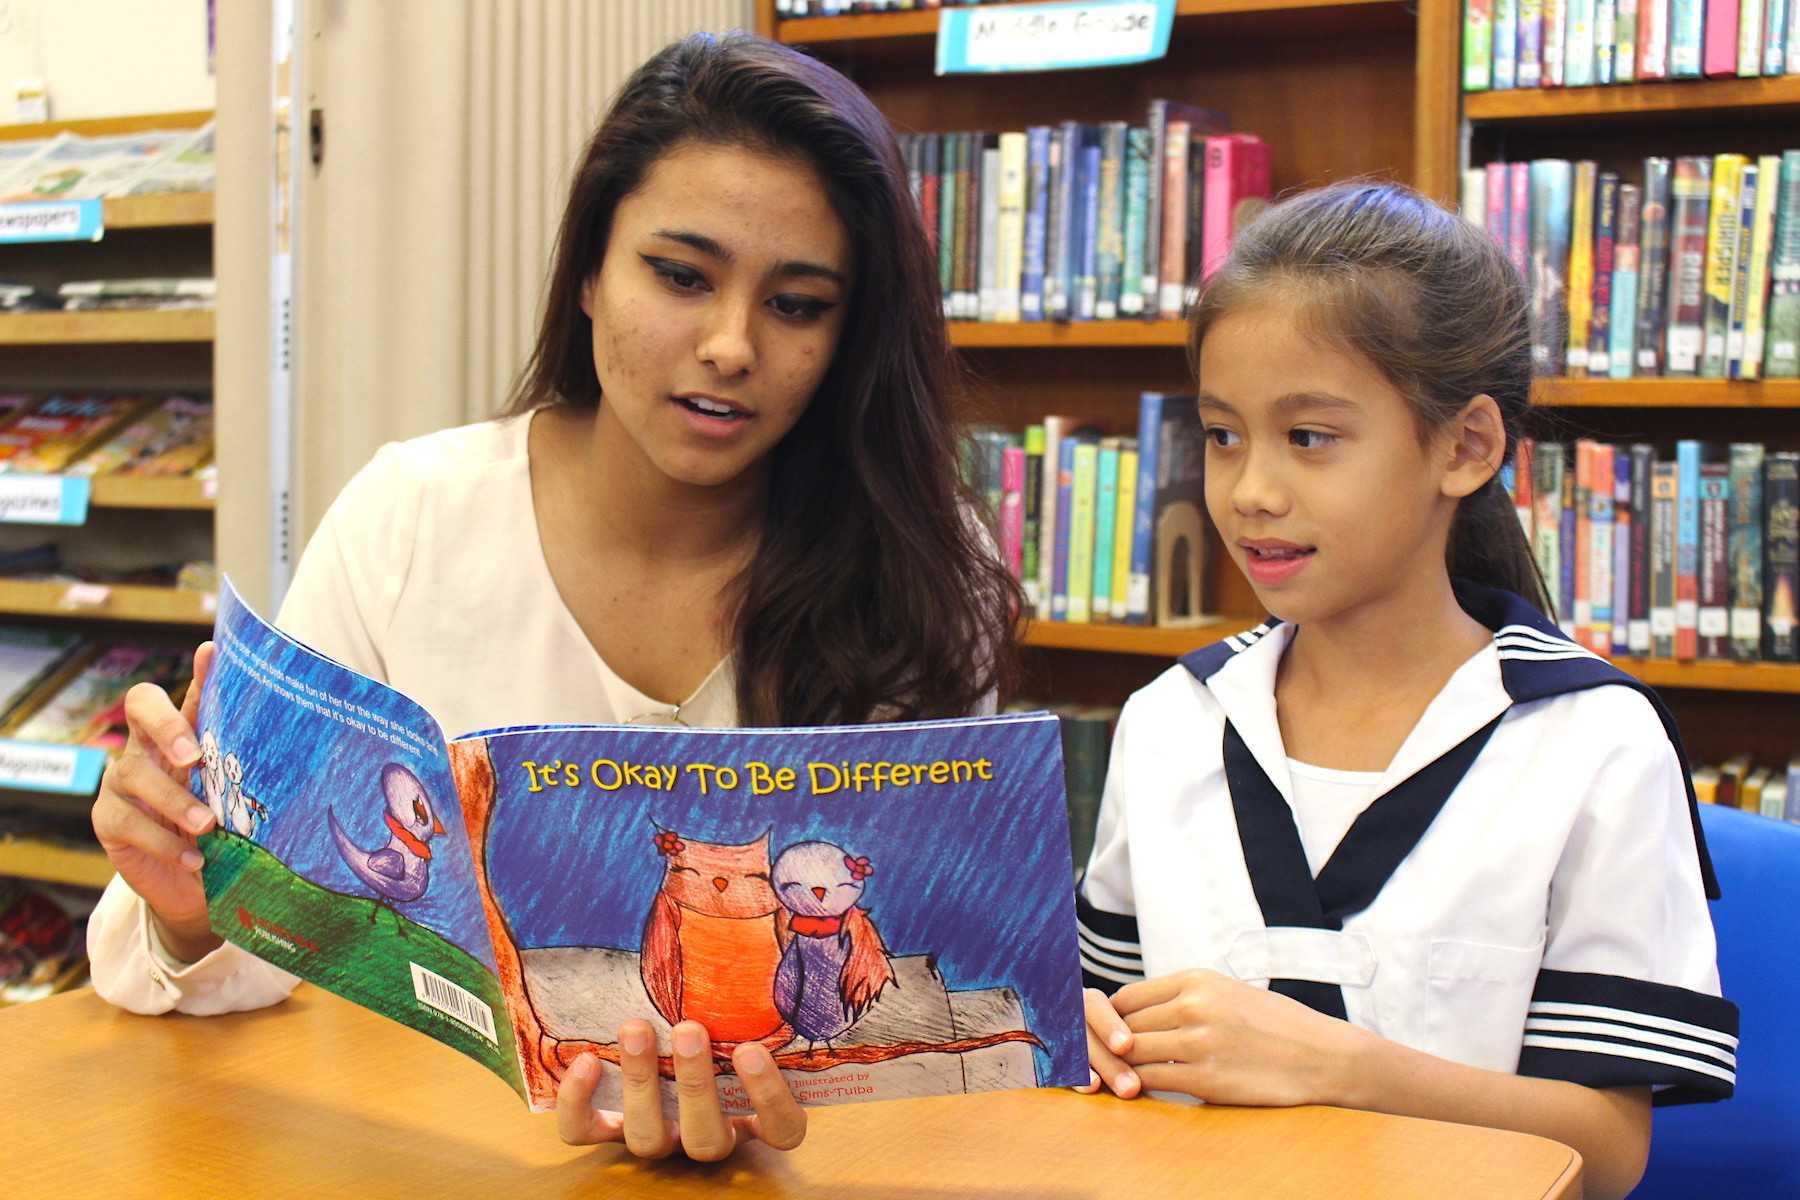 Junior Mahealani Sims-Tulba reads her book to second grader Leilani Freitas.